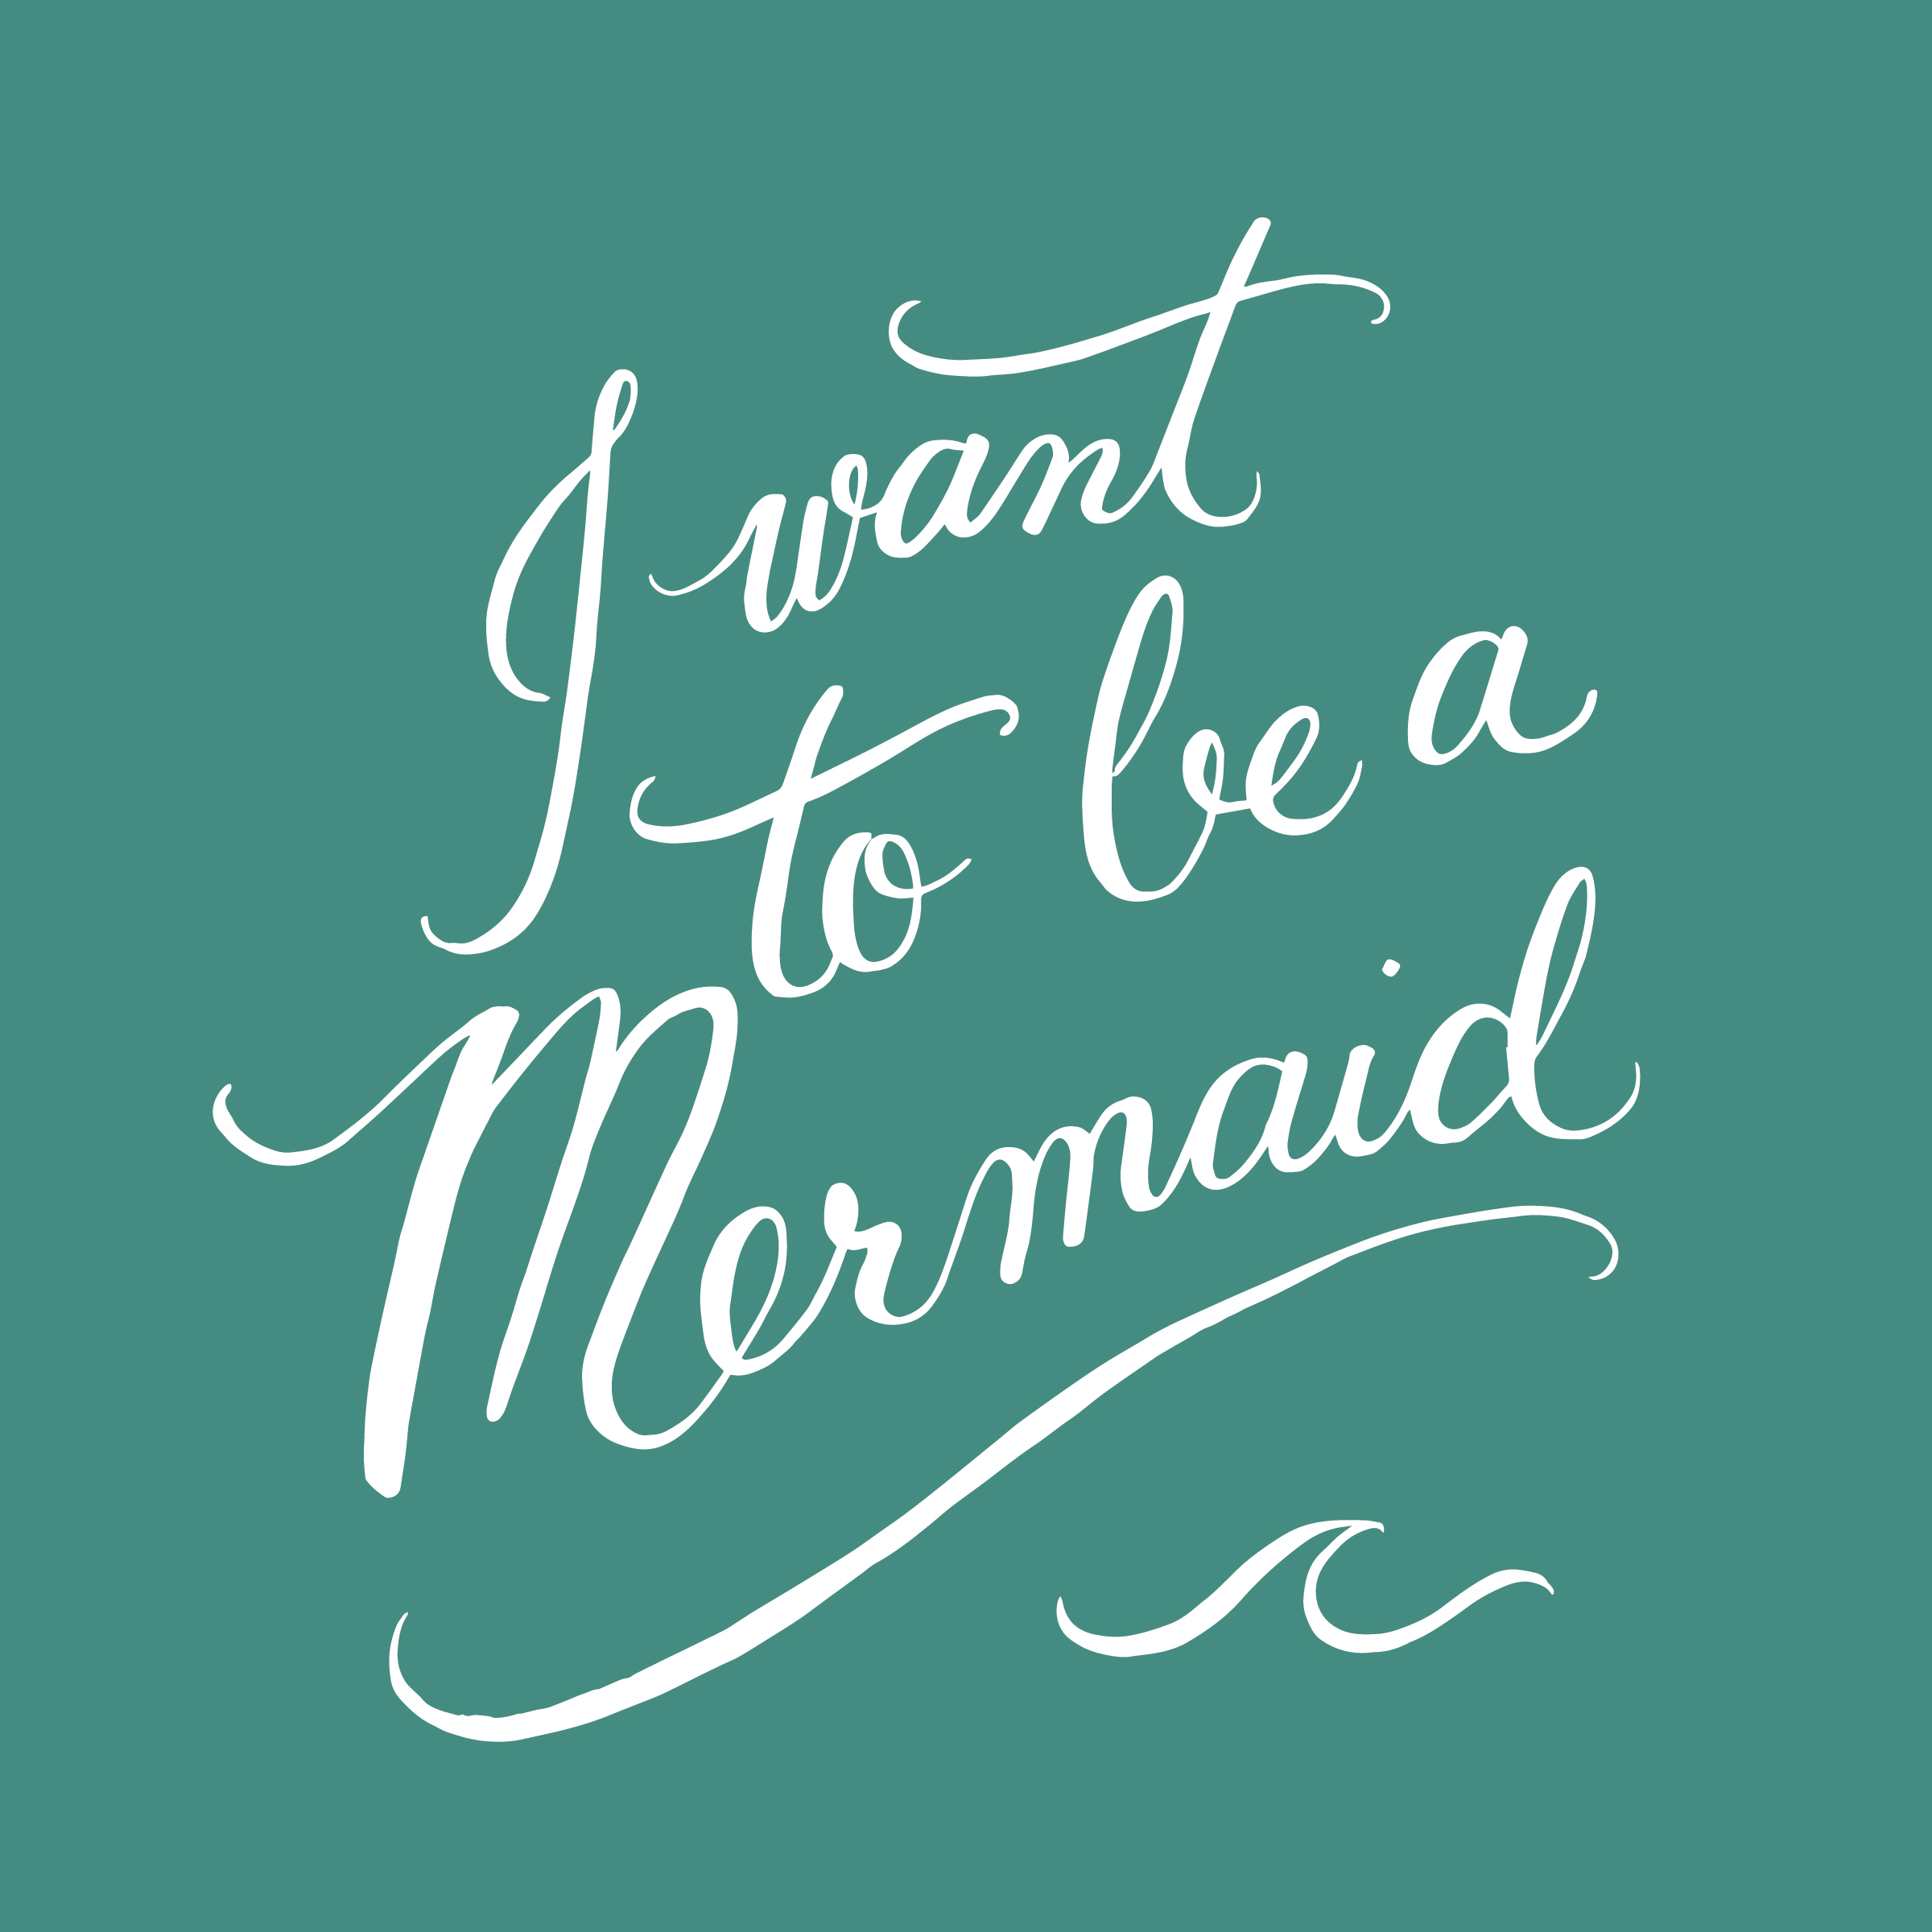 I Want To Be A Mermaid - andreacrofts.com.jpg